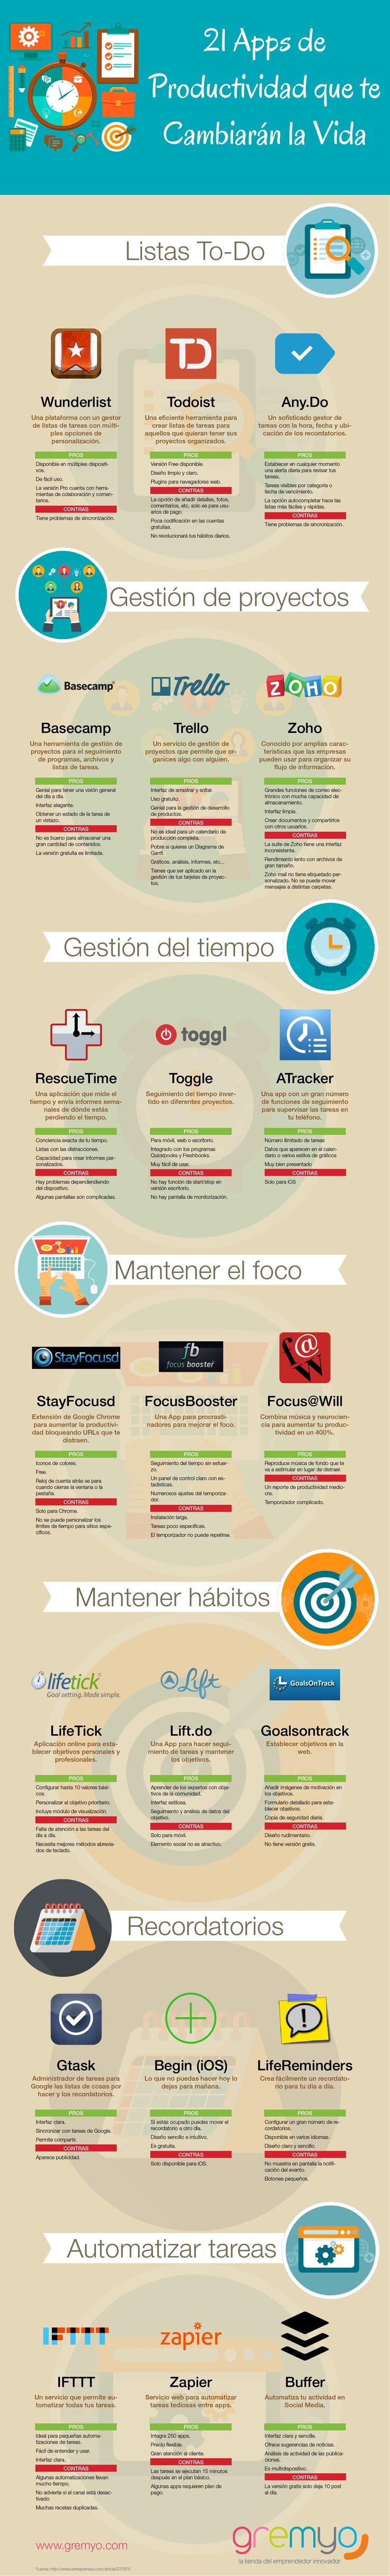 21 Apps de Productividad que Te Cambiarán la Vida #infografia #infographic #apps